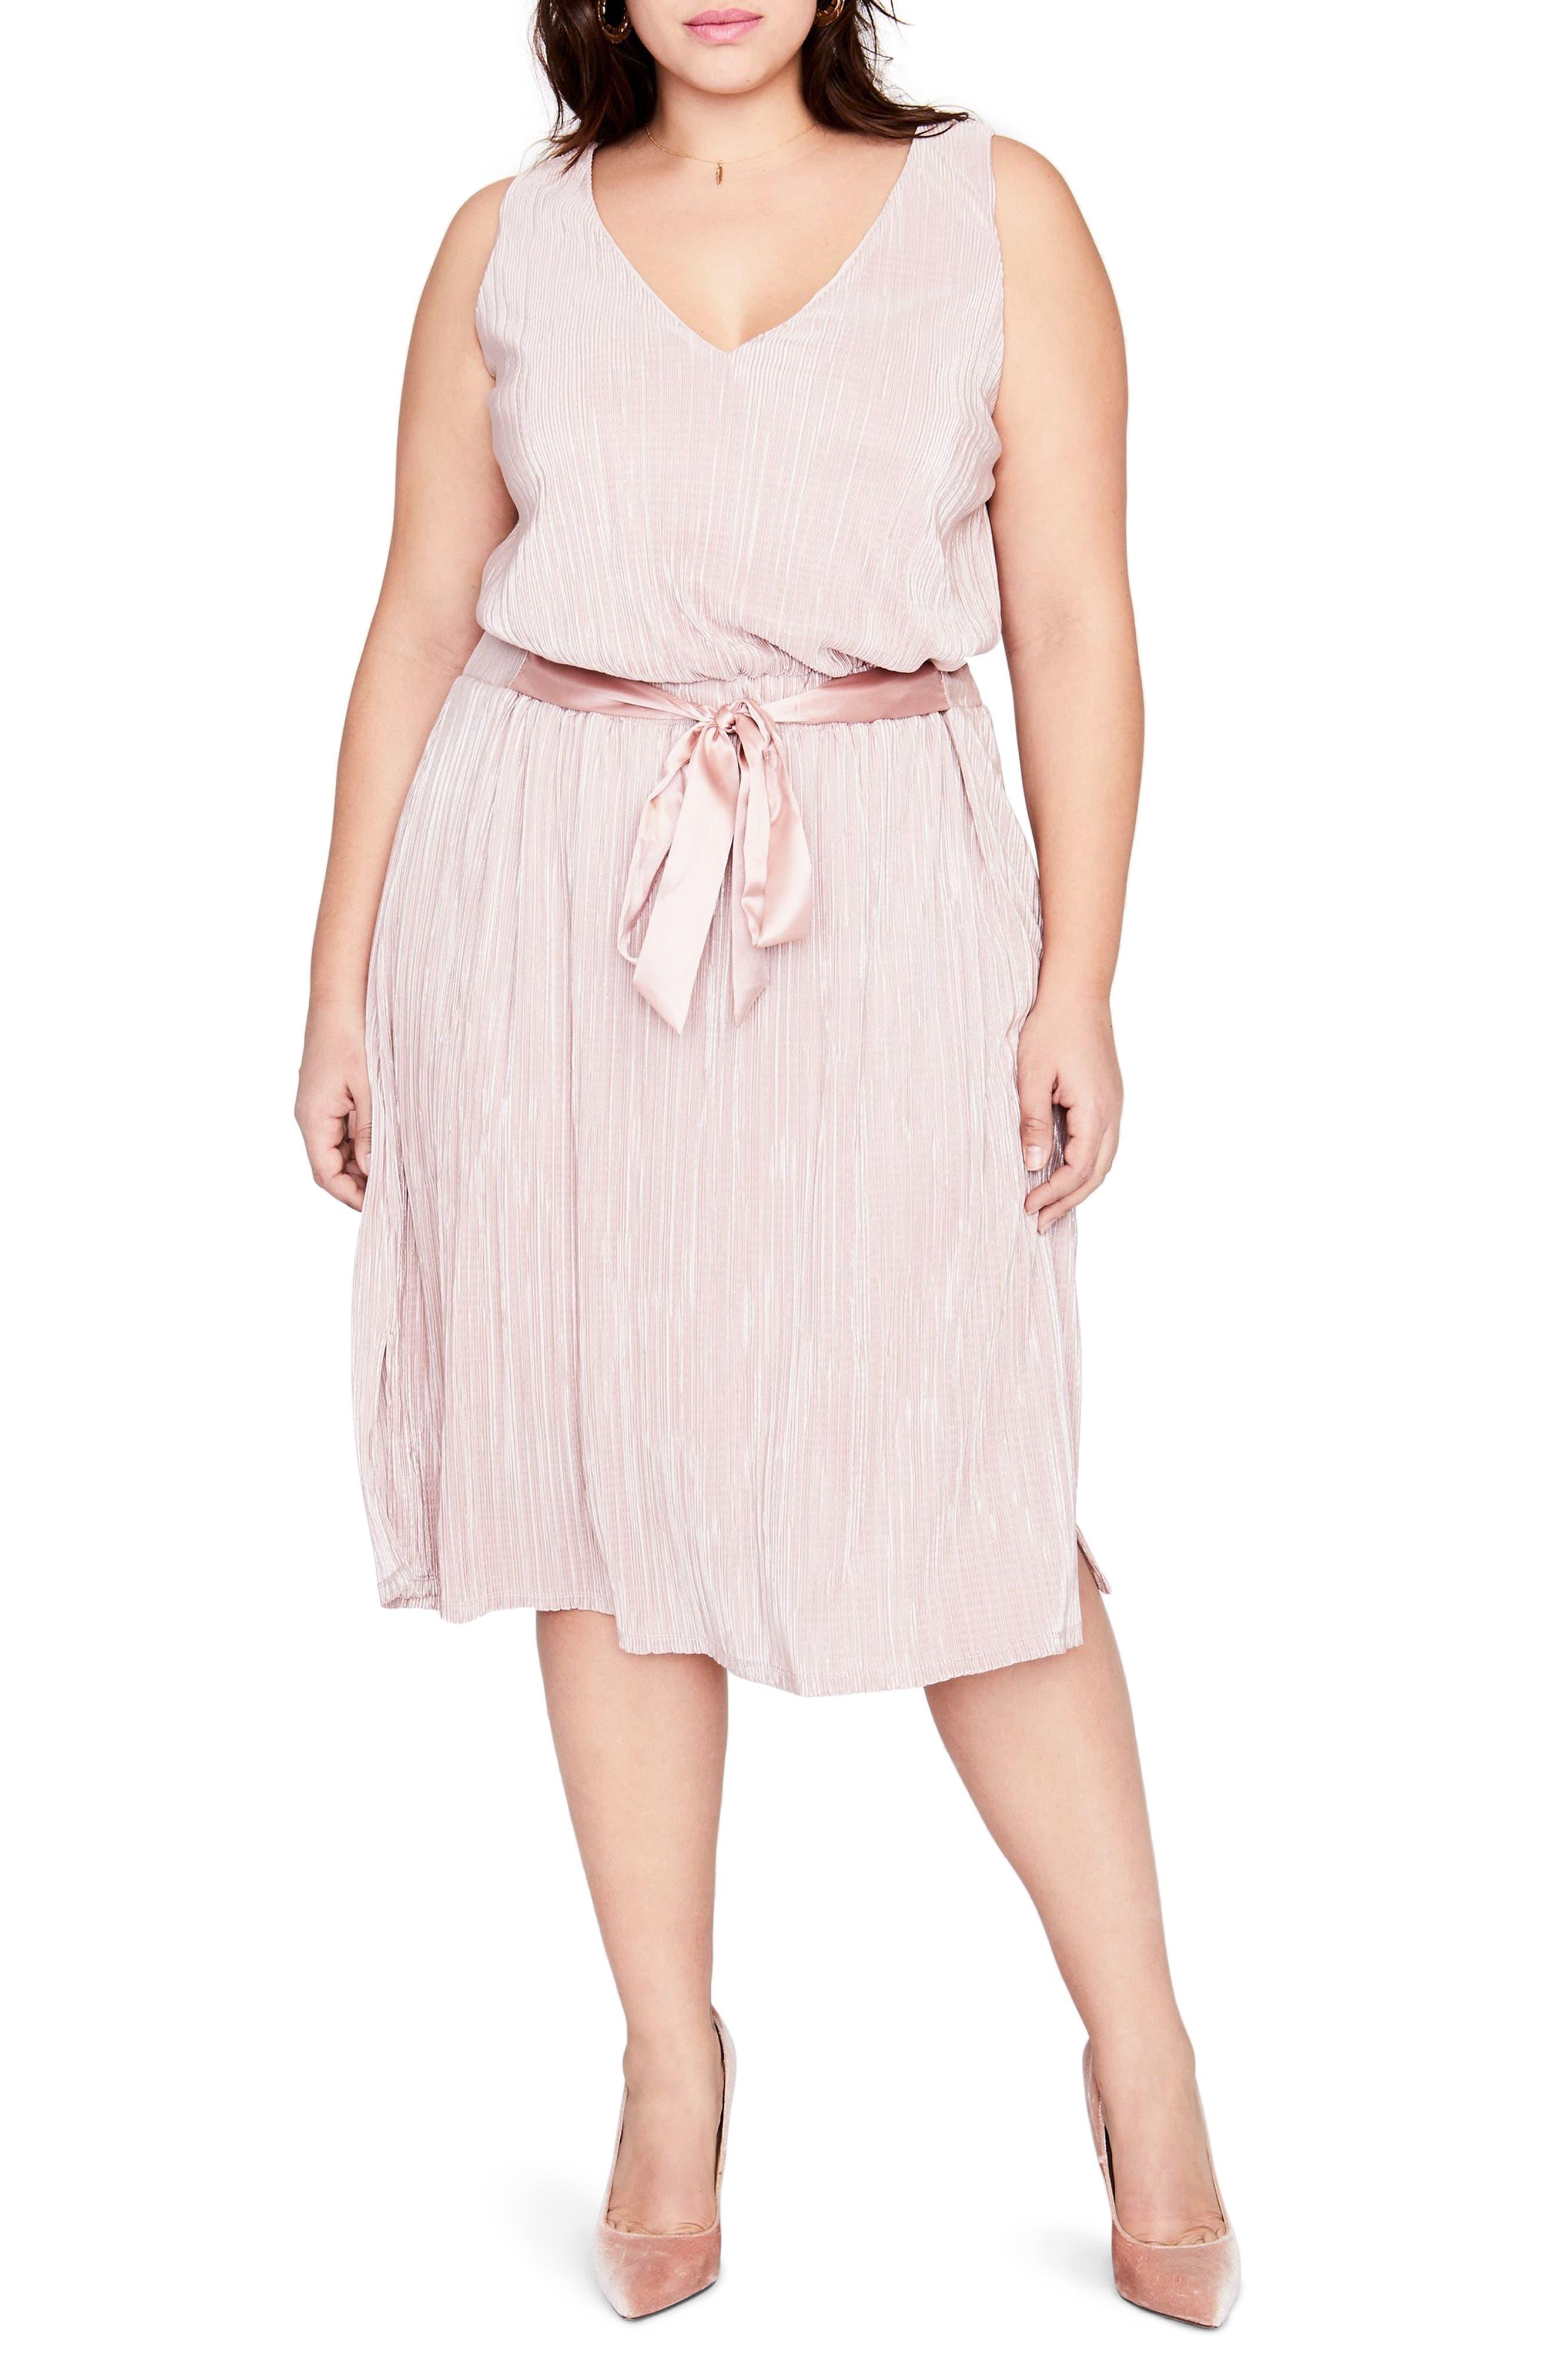 Belted Metallic Pleated Blouson Dress,                             Main thumbnail 1, color,                             Blush Combo